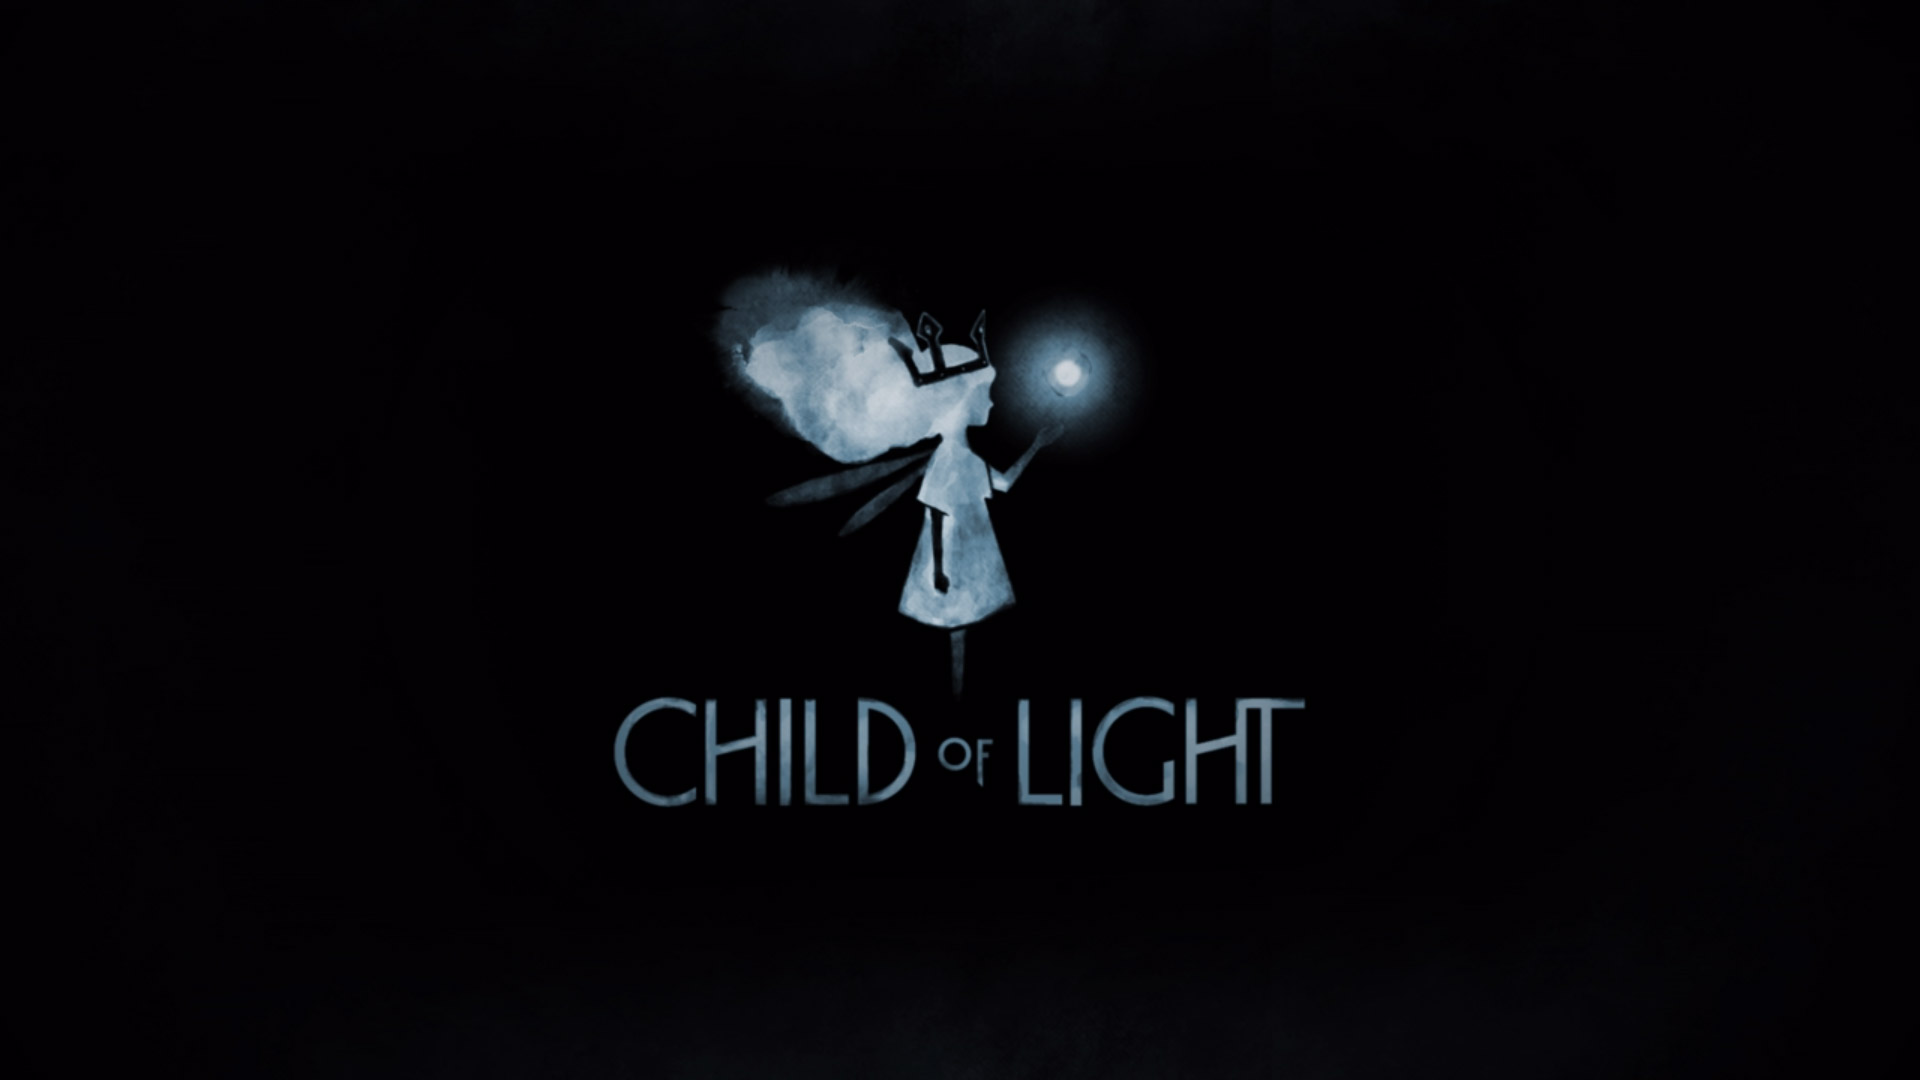 Free Child of Light Wallpaper in 1920x1080